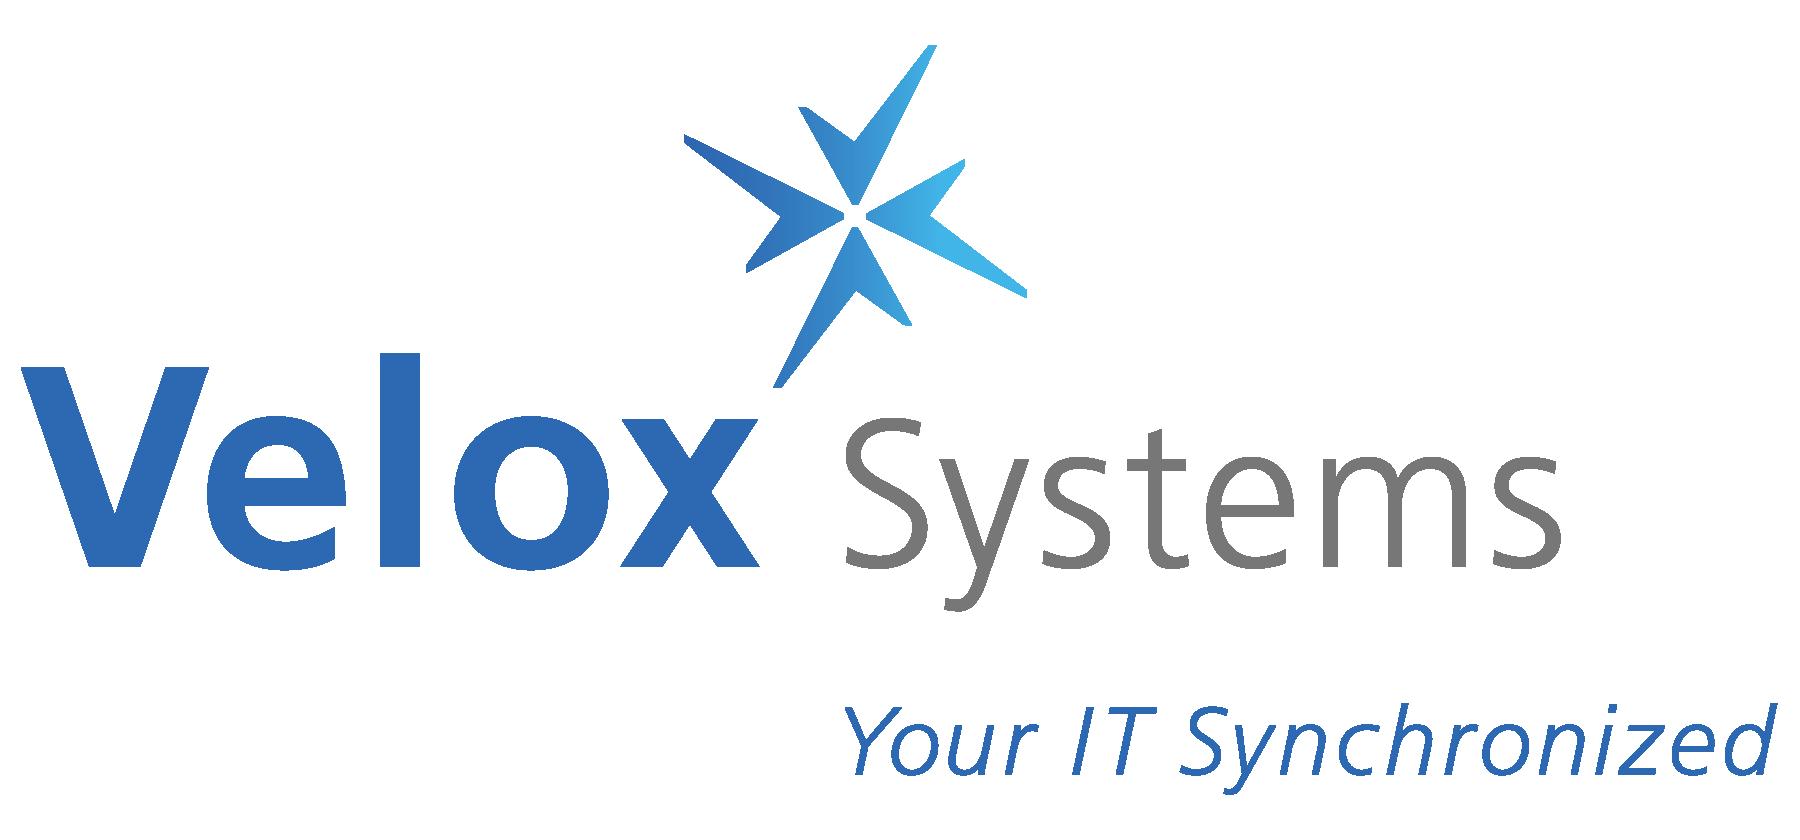 Velox Systems